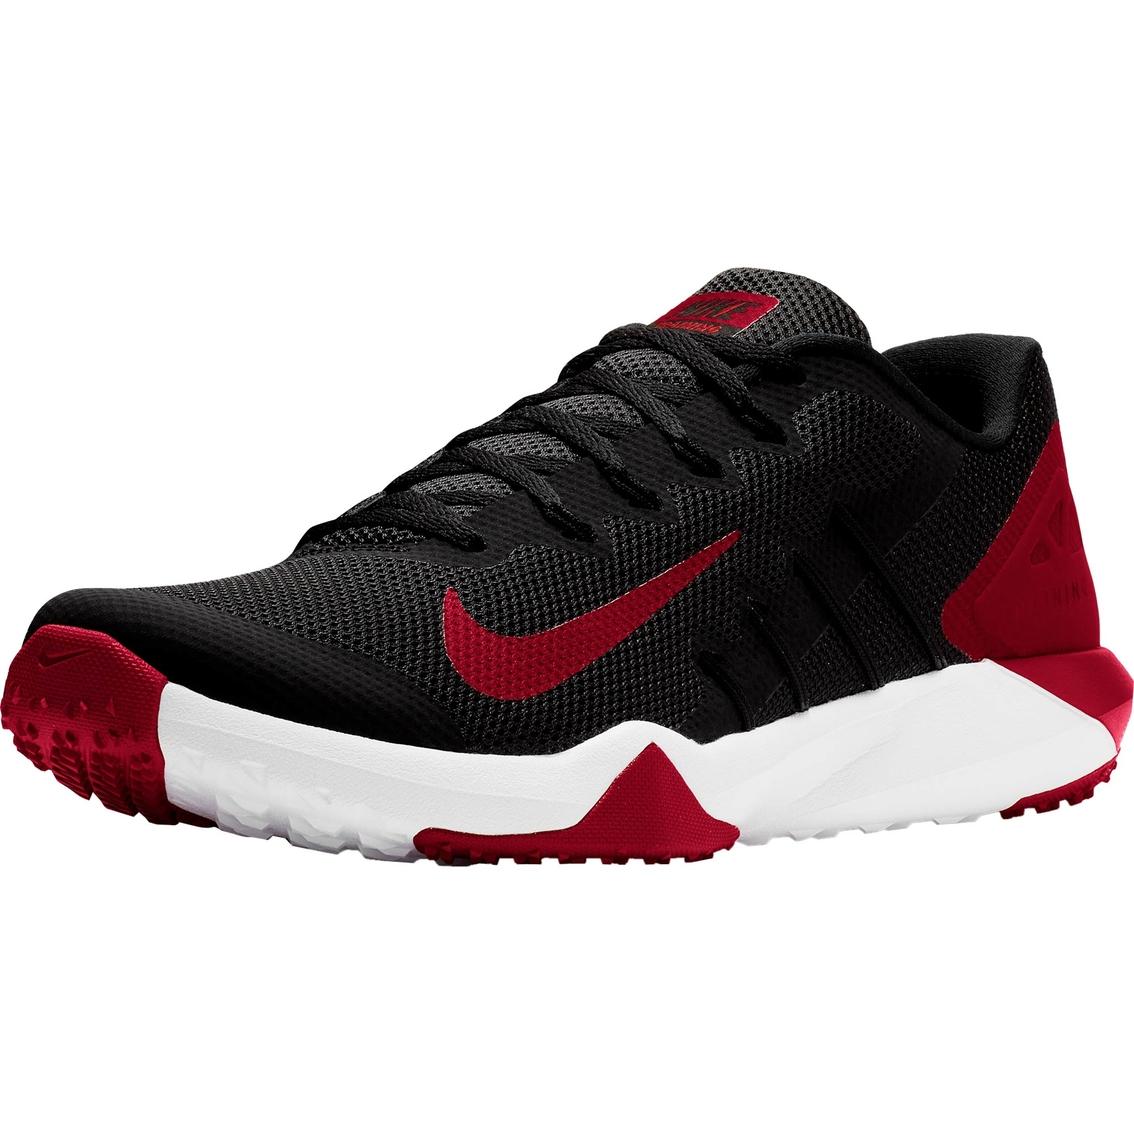 e5784307f7e80 Nike Retaliation Trainer 2 Shoes | Running | Shoes | Shop The Exchange